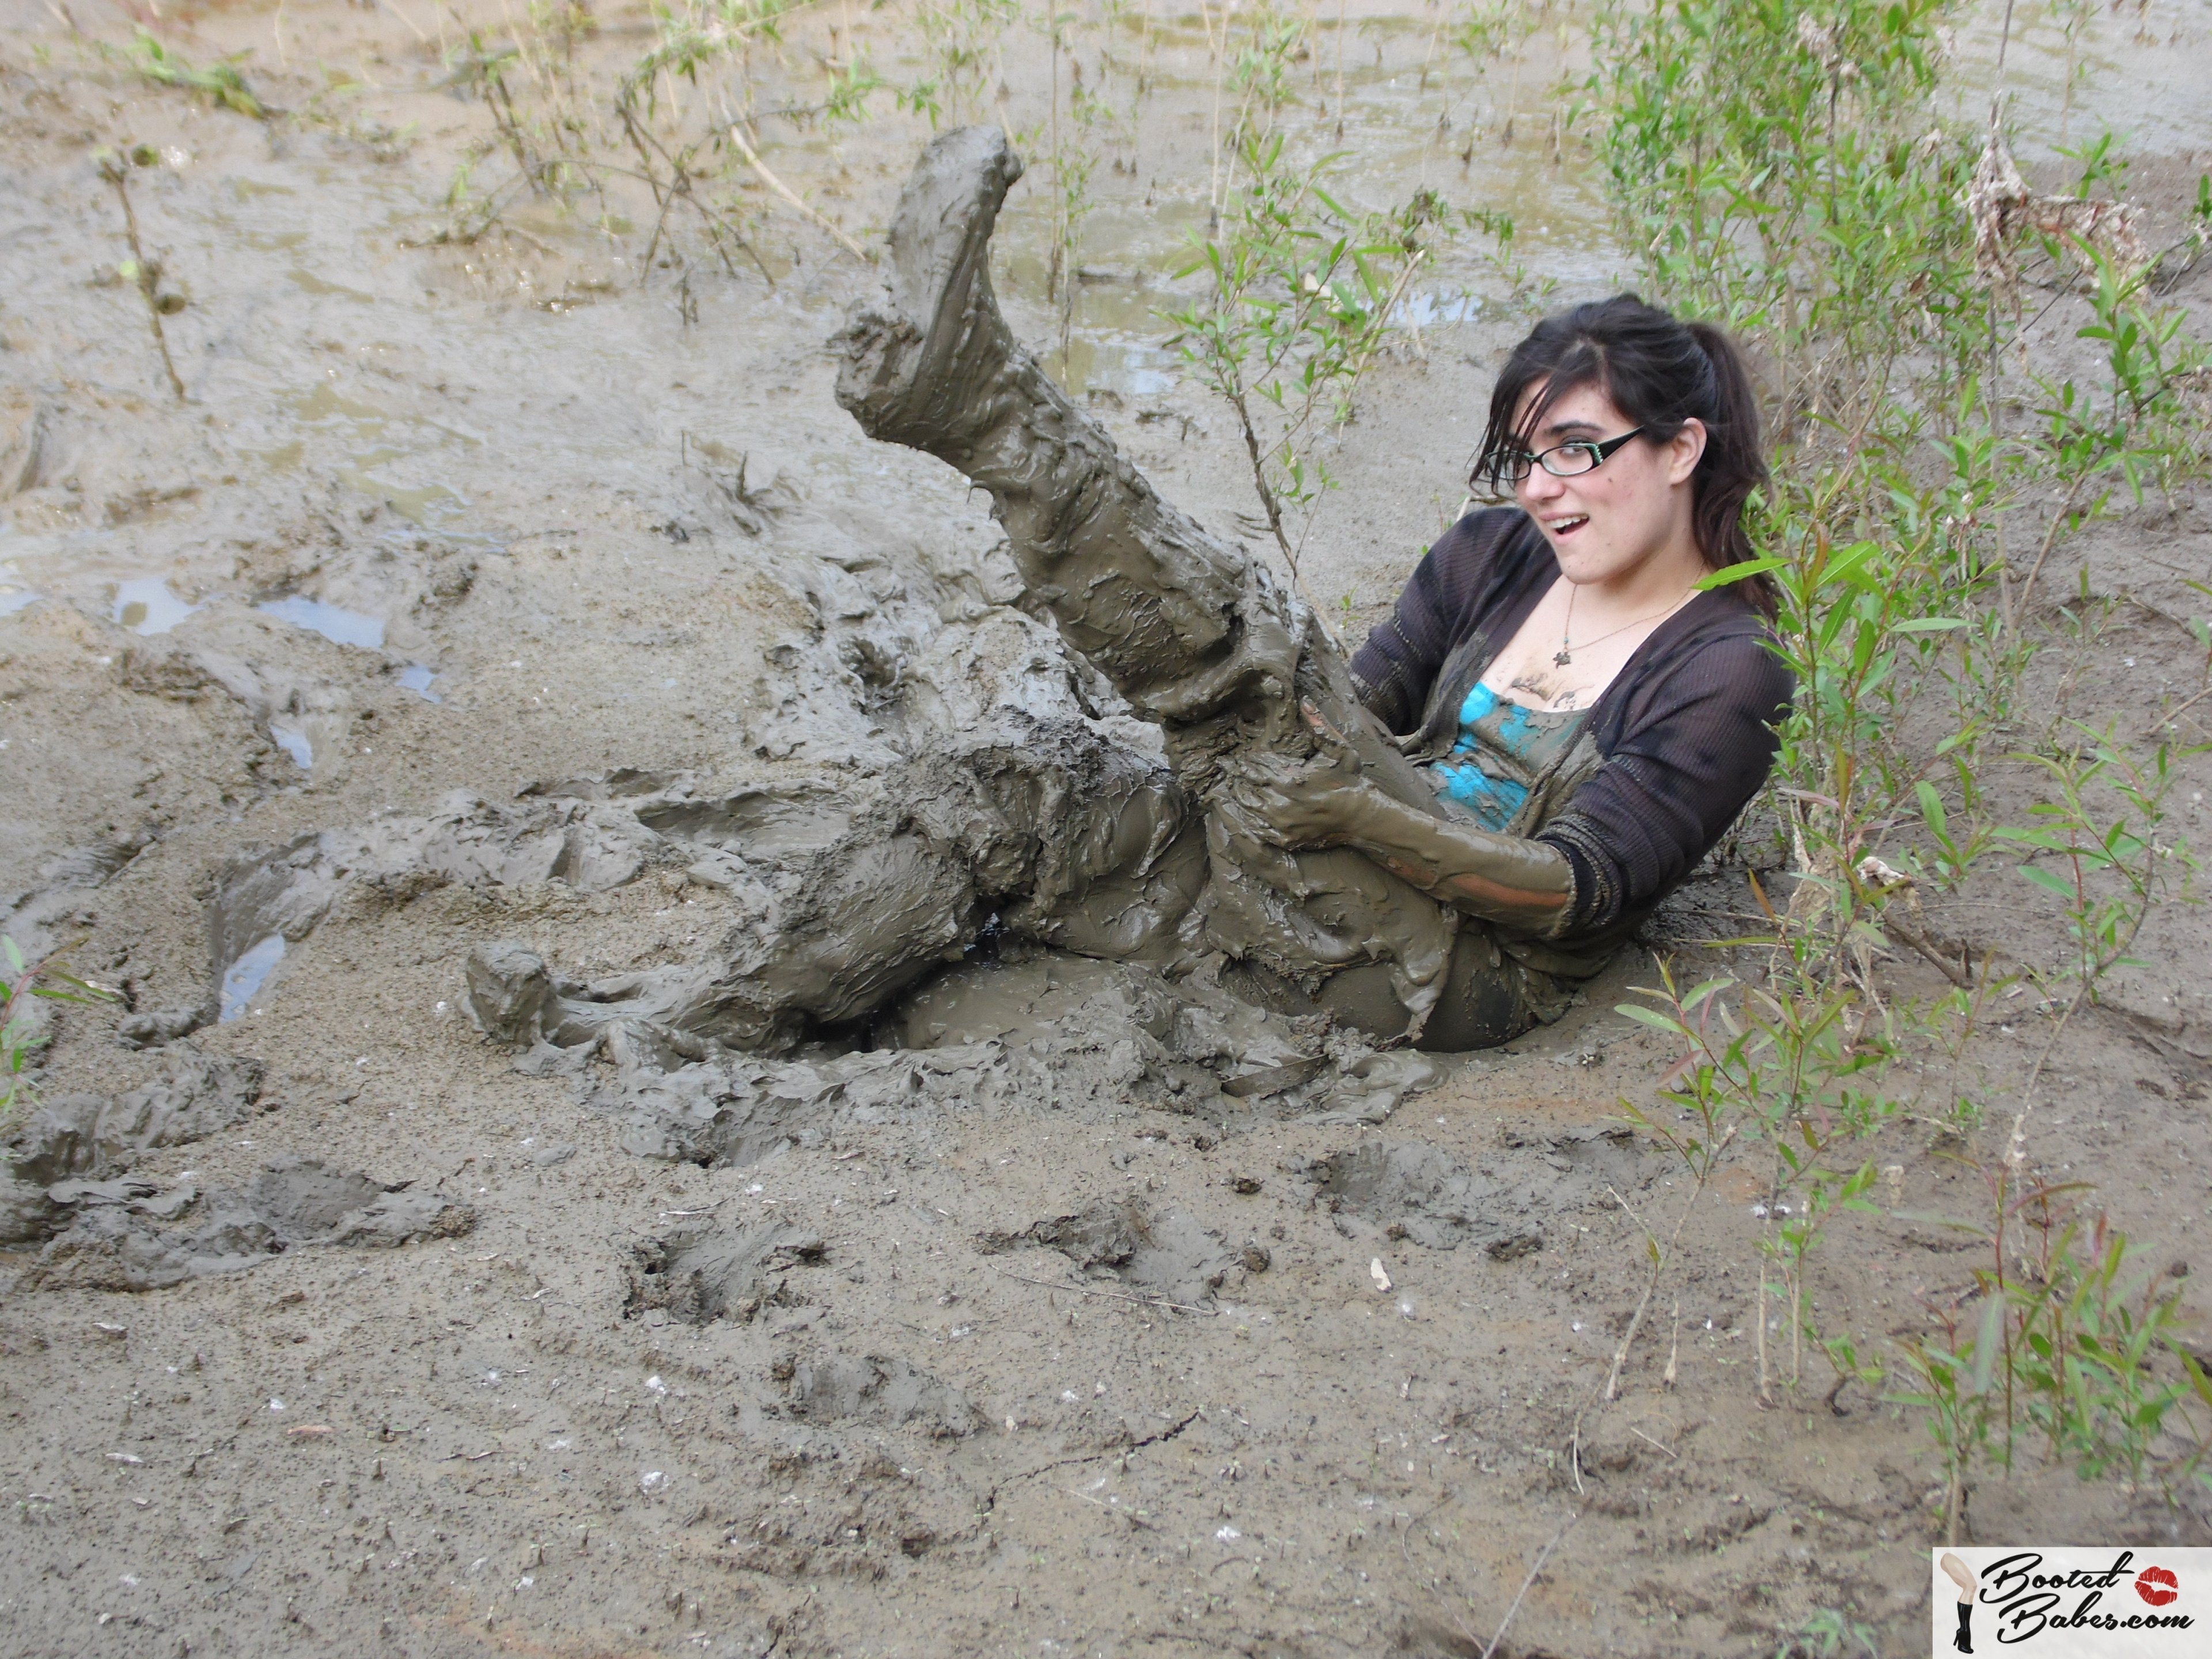 Меряемся грязевыми ямами. Nearas-muddy-waders_14